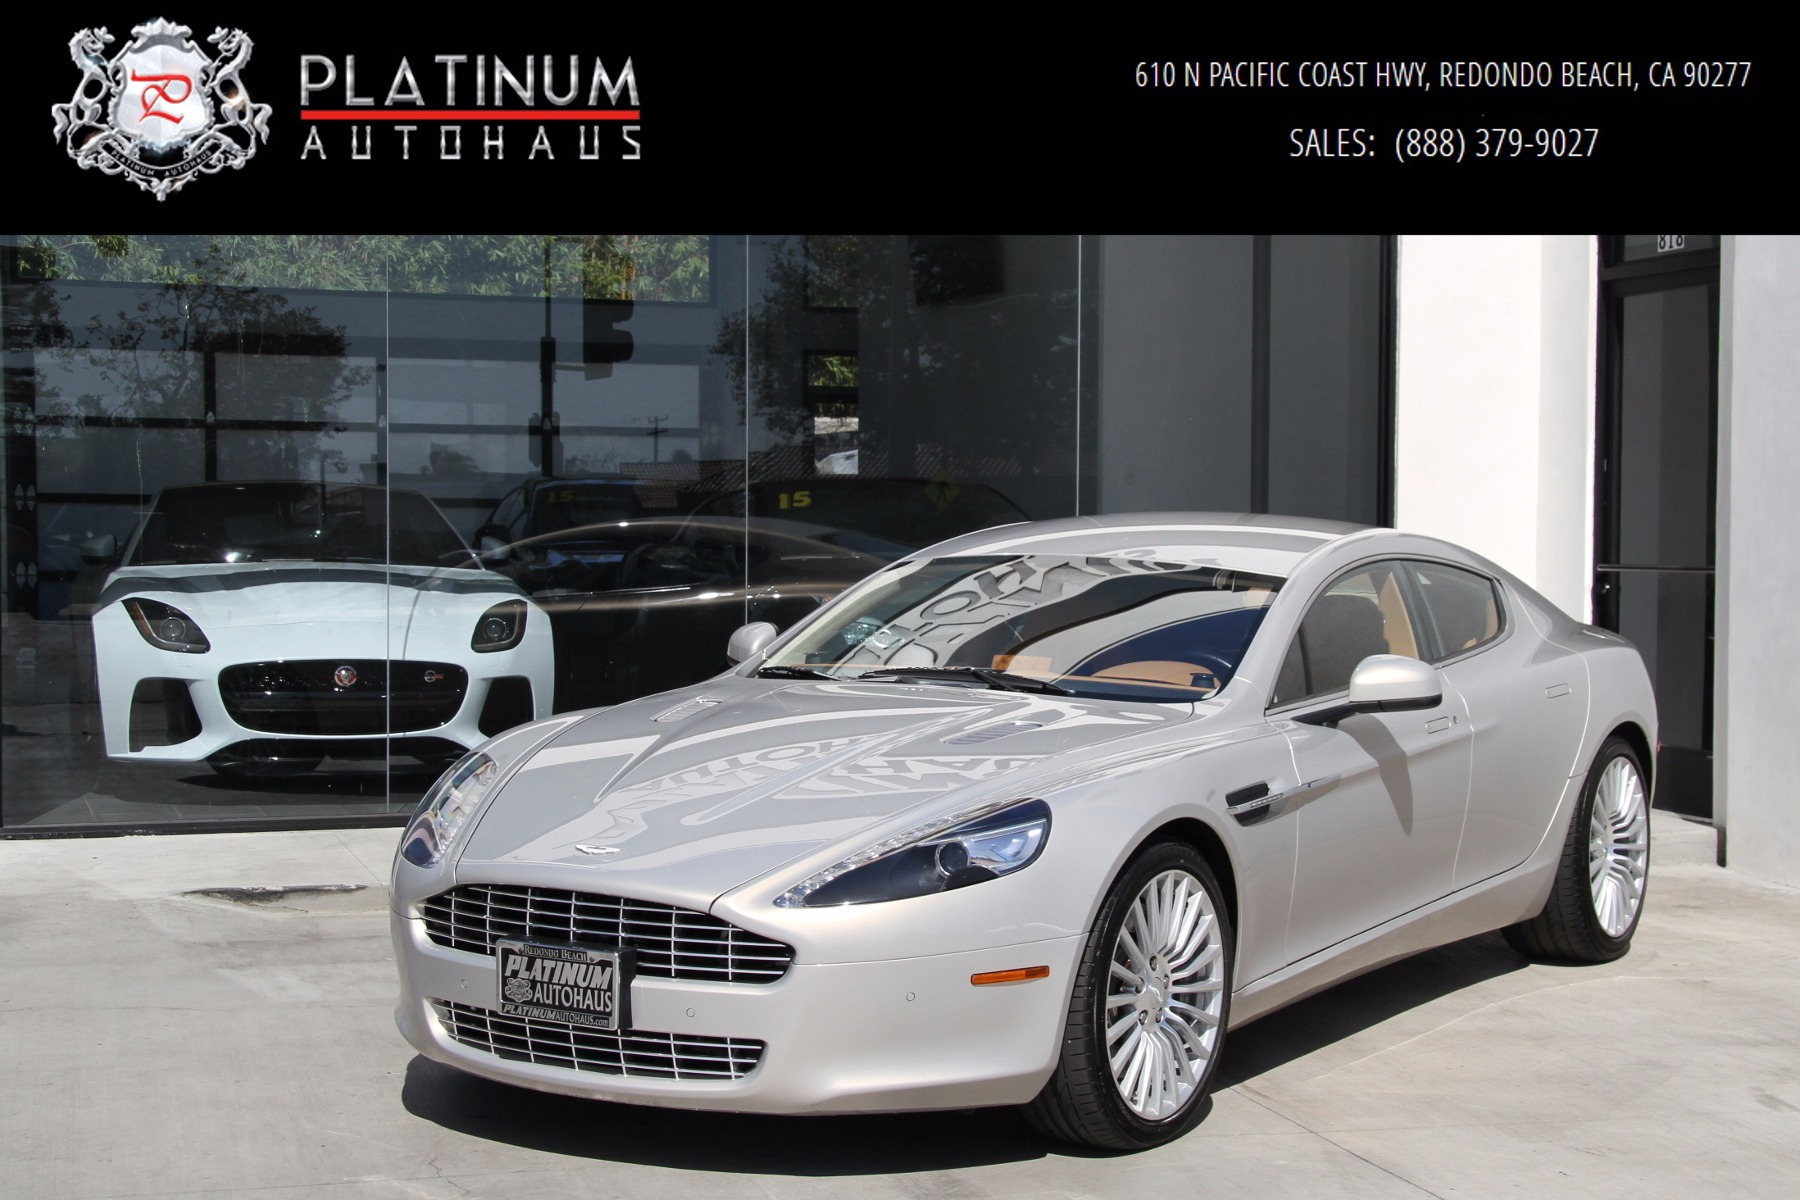 2011 Aston Martin Rapide Stock 5993 For Sale Near Redondo Beach Ca Ca Aston Martin Dealer